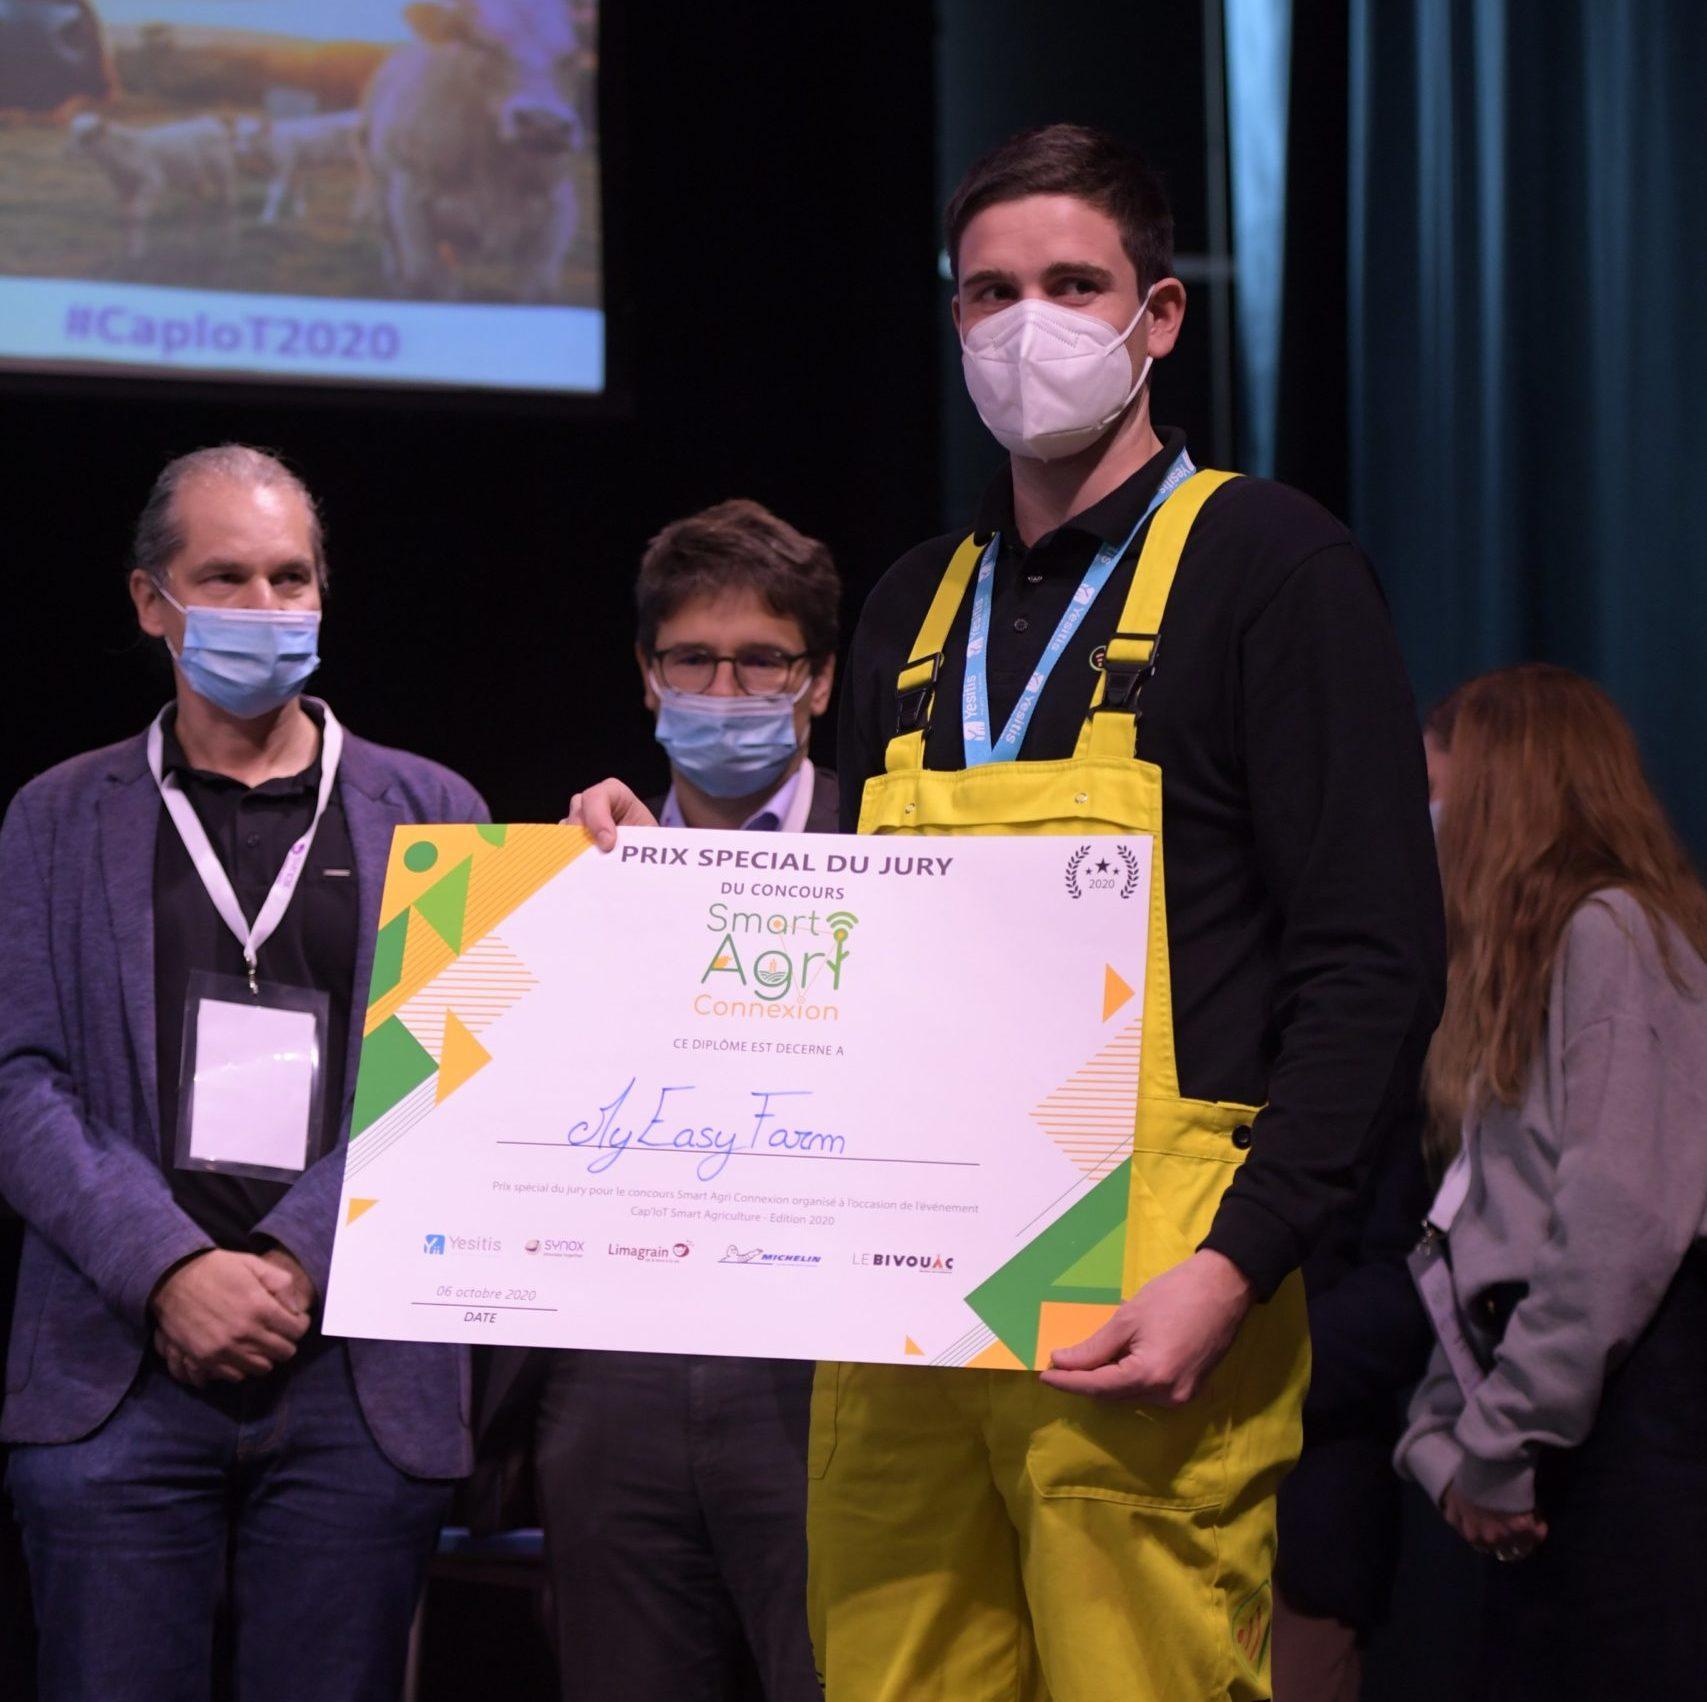 MyEasyFarm prix du jury - Smart Agri Connexion